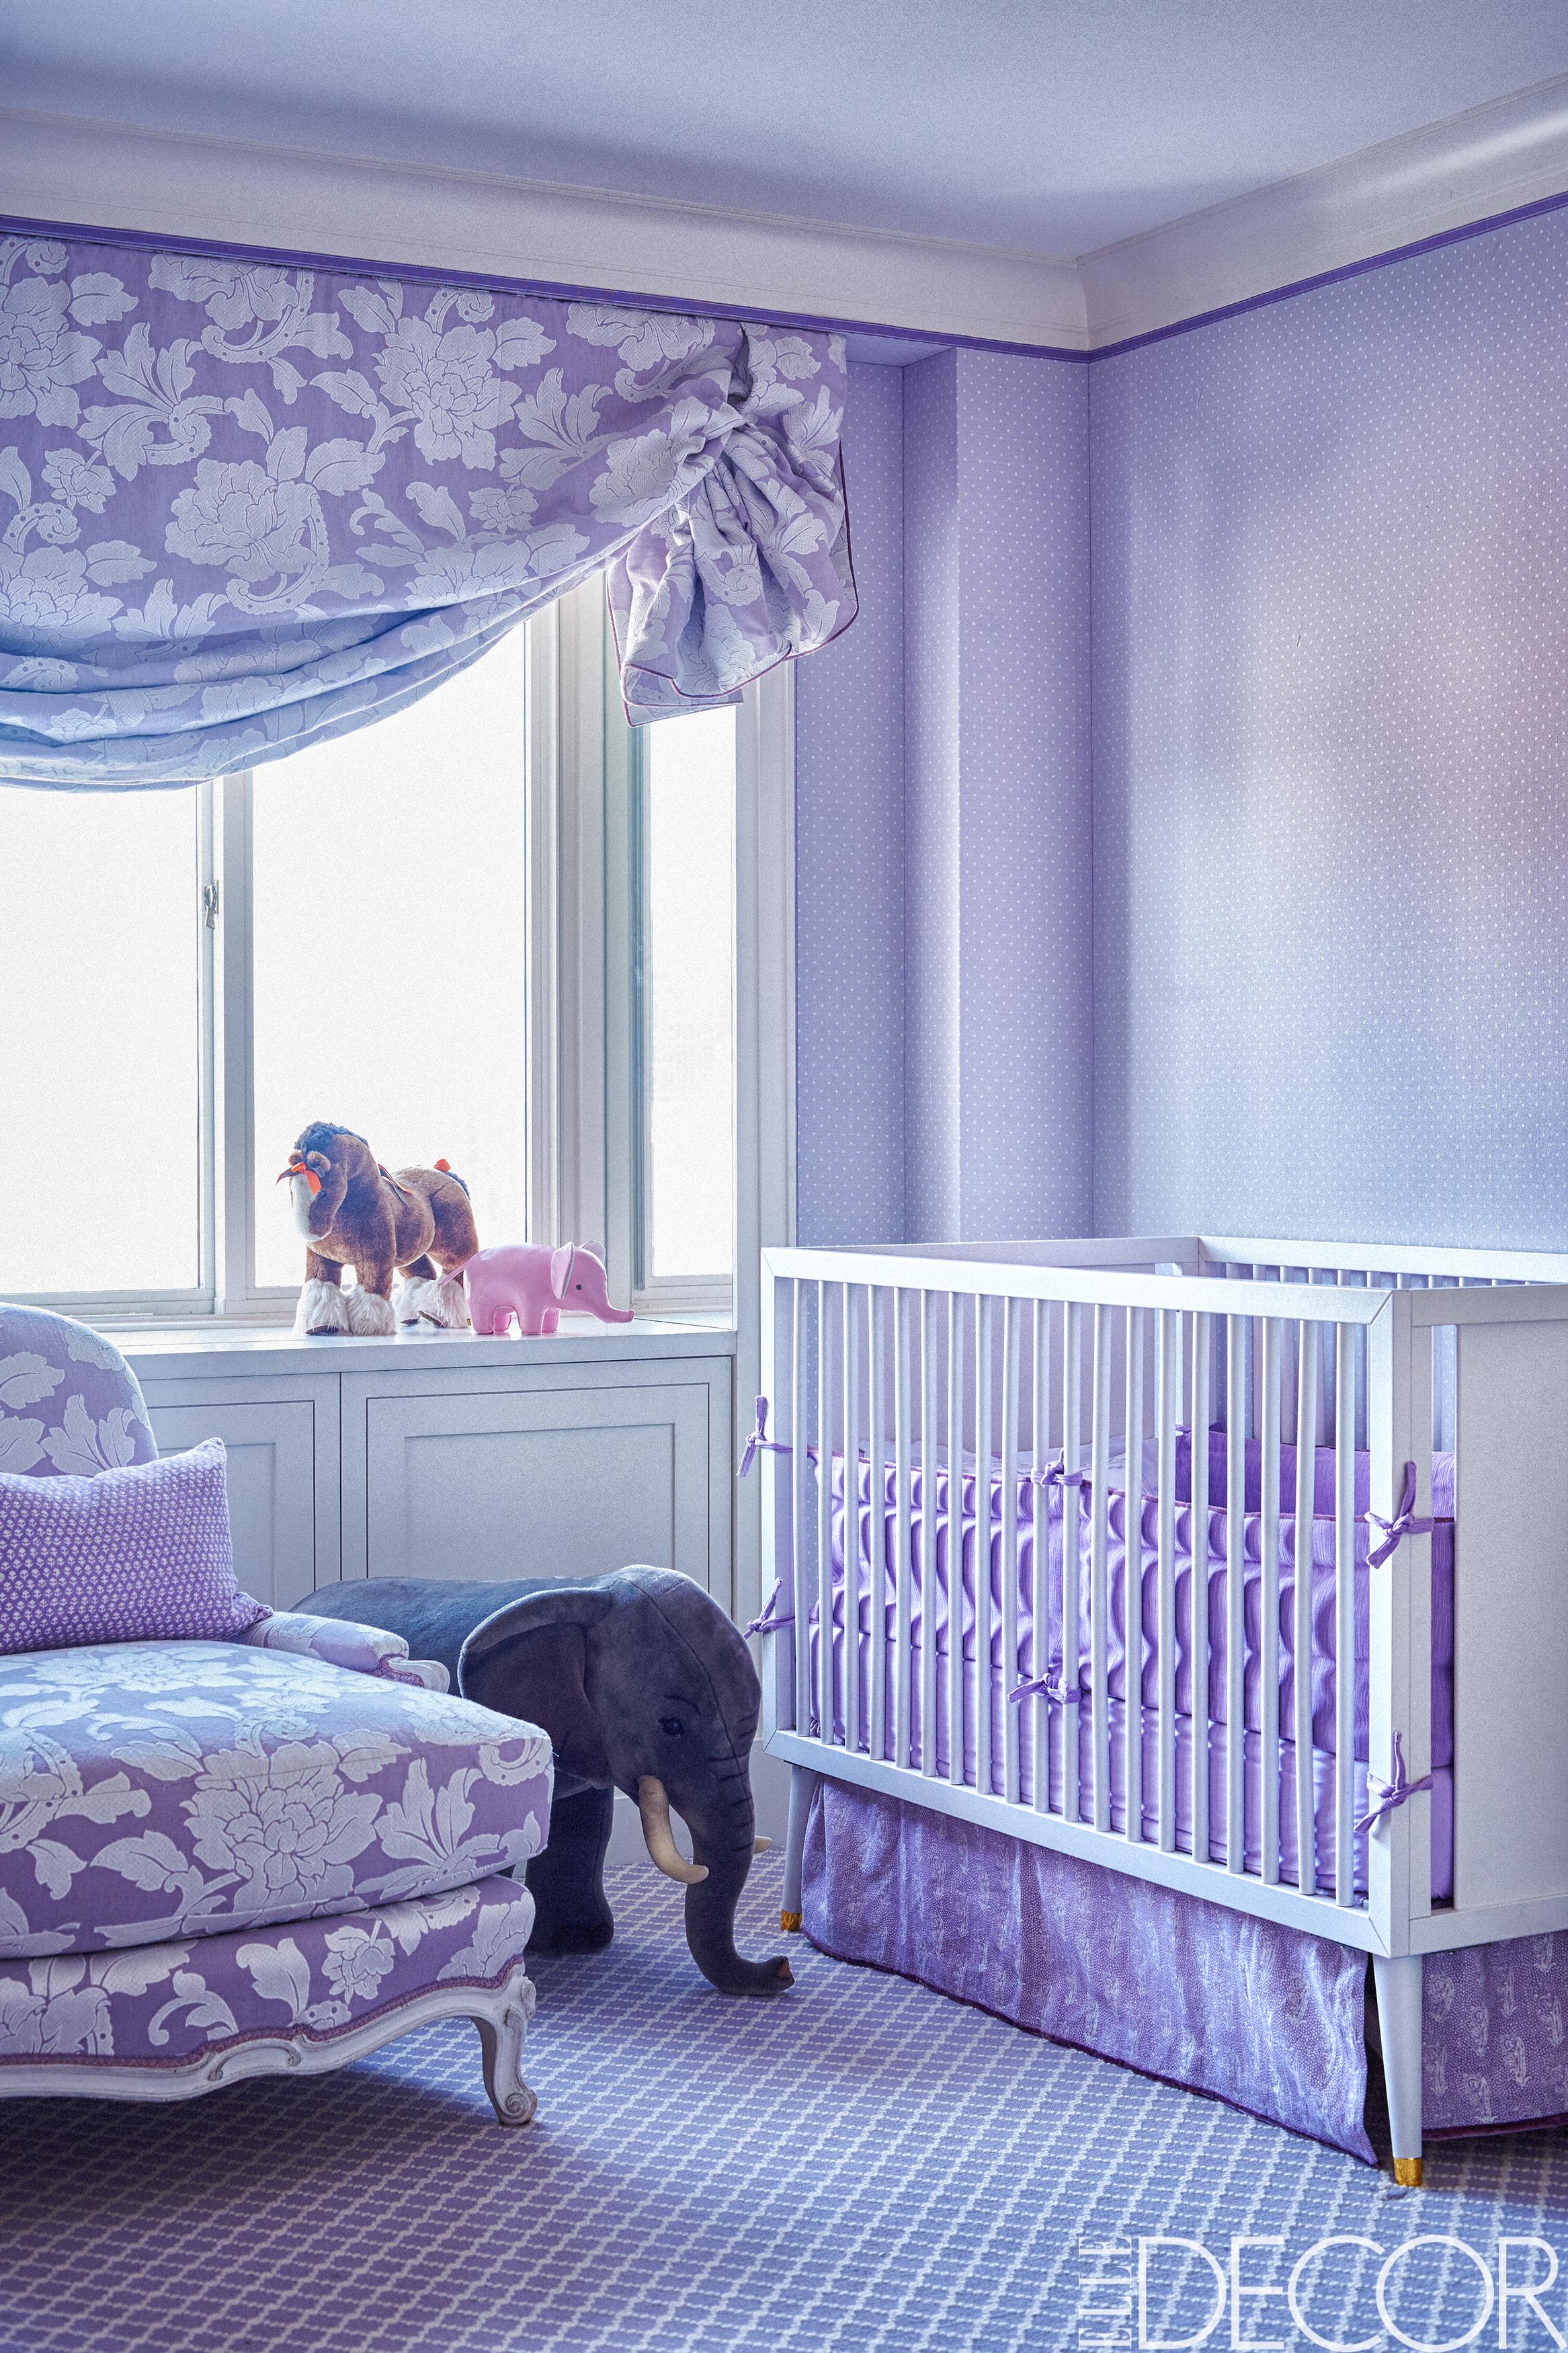 Baby Room Murals: Nursery Decorating Furniture & Decor